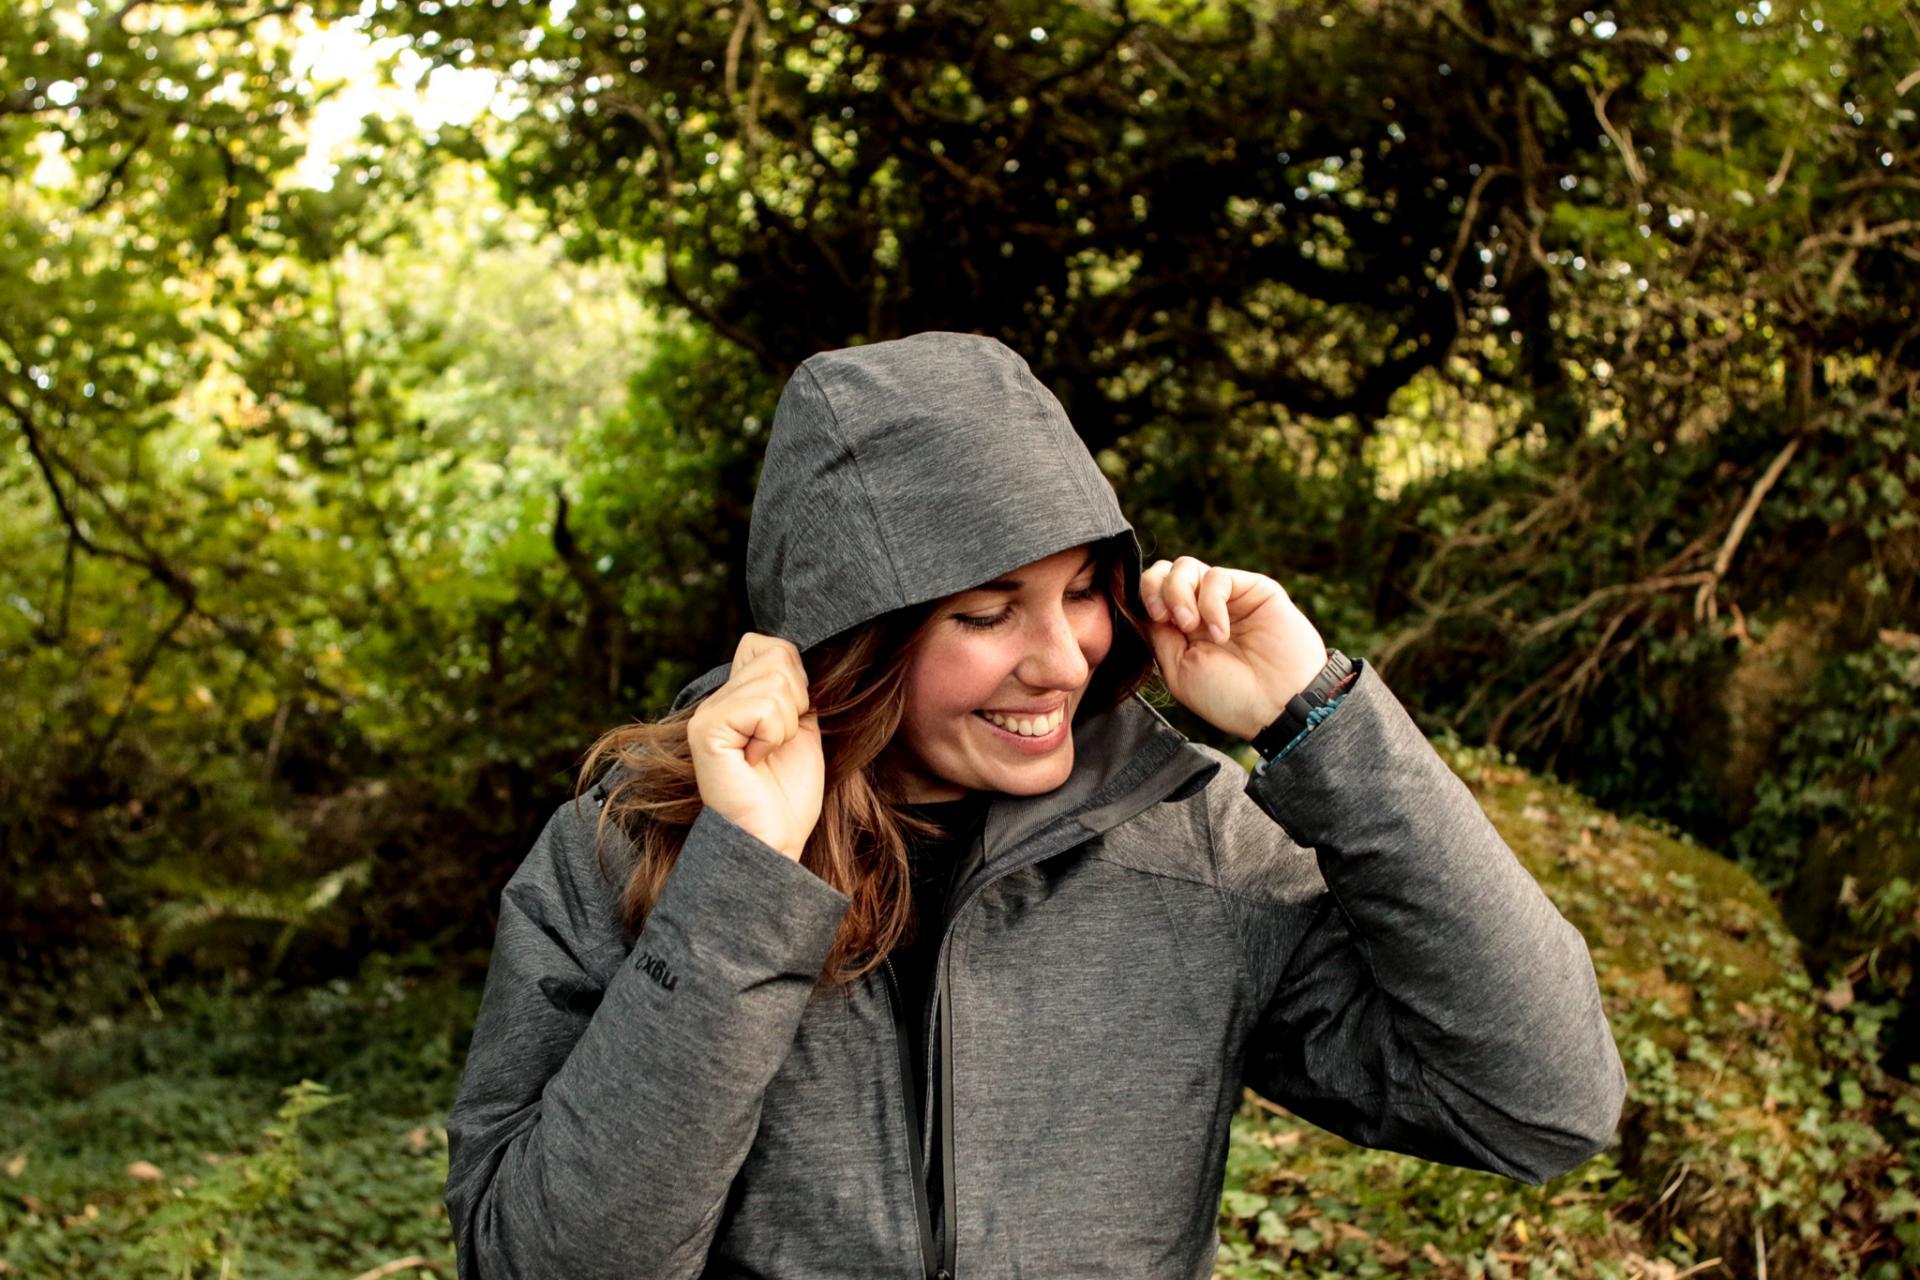 Review: Kathmandu Benmore 5-in-1 jacket